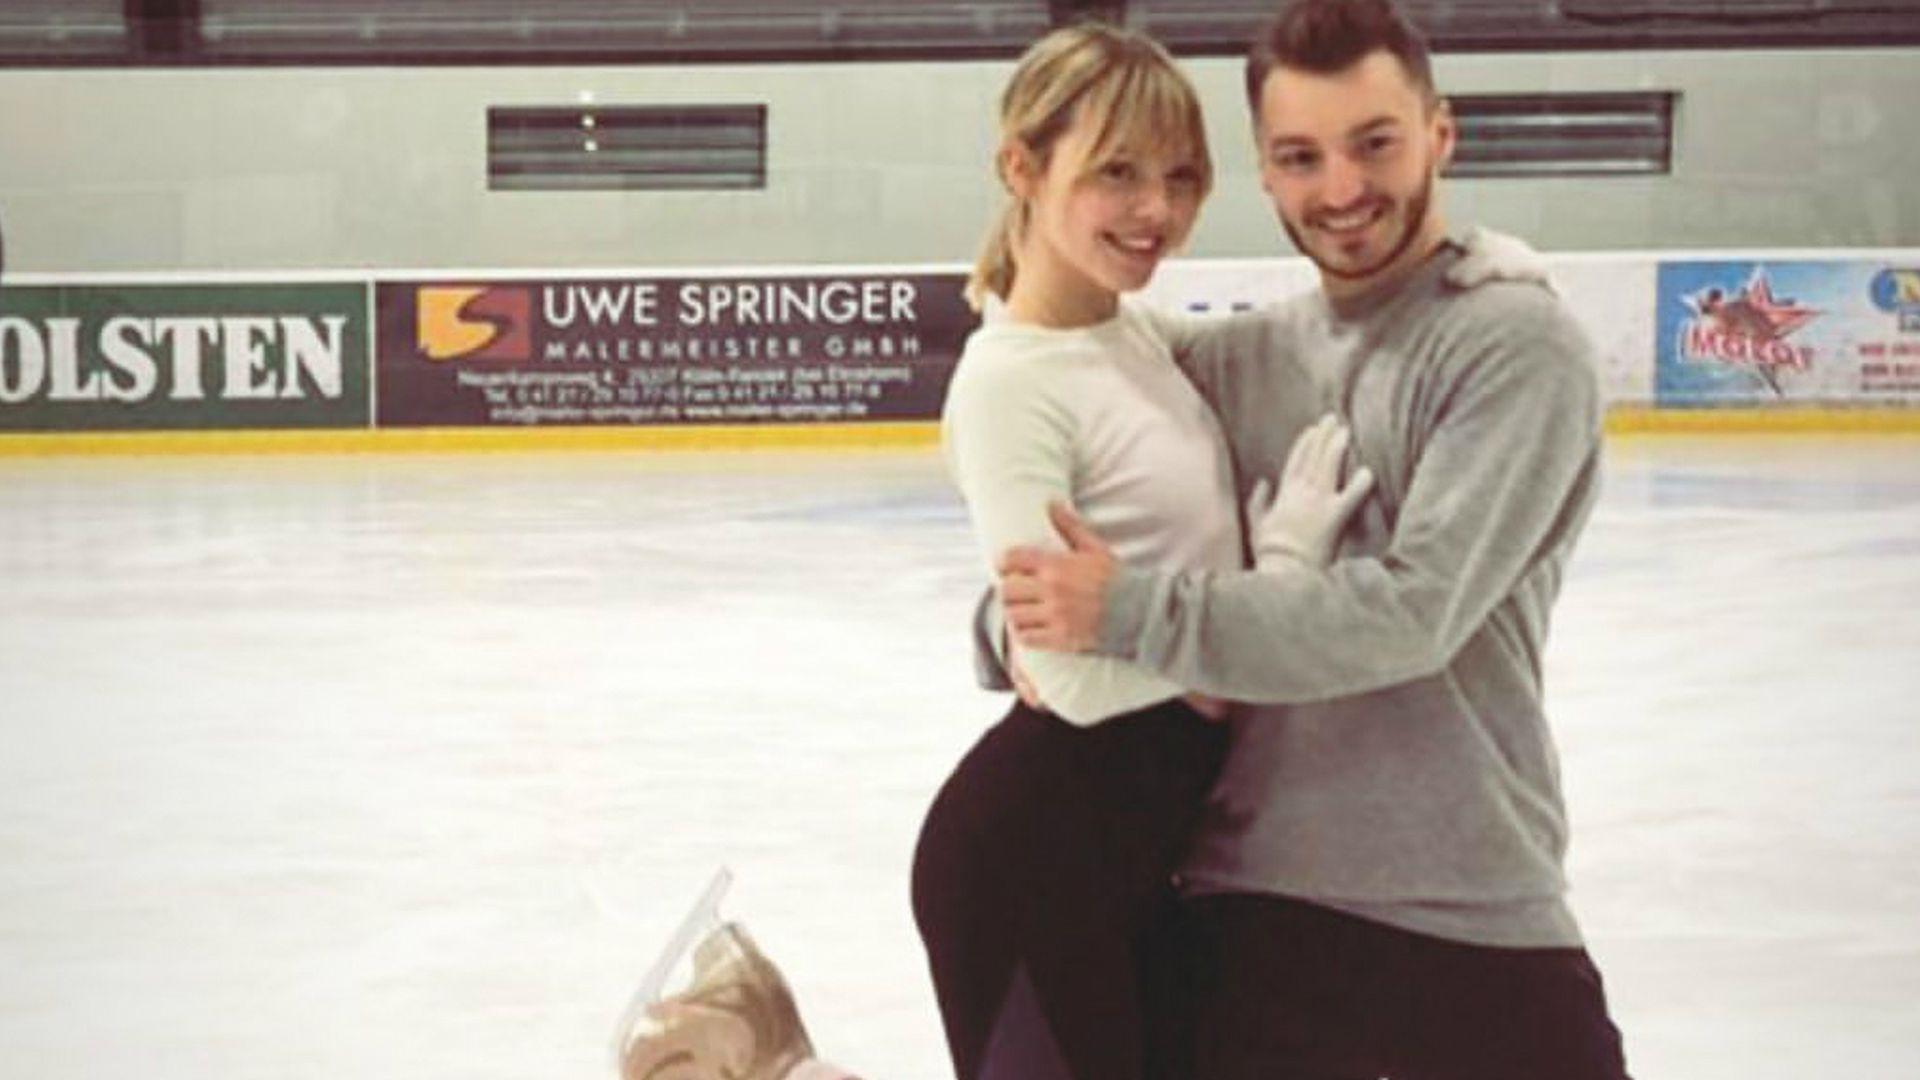 Lina dancing on ice